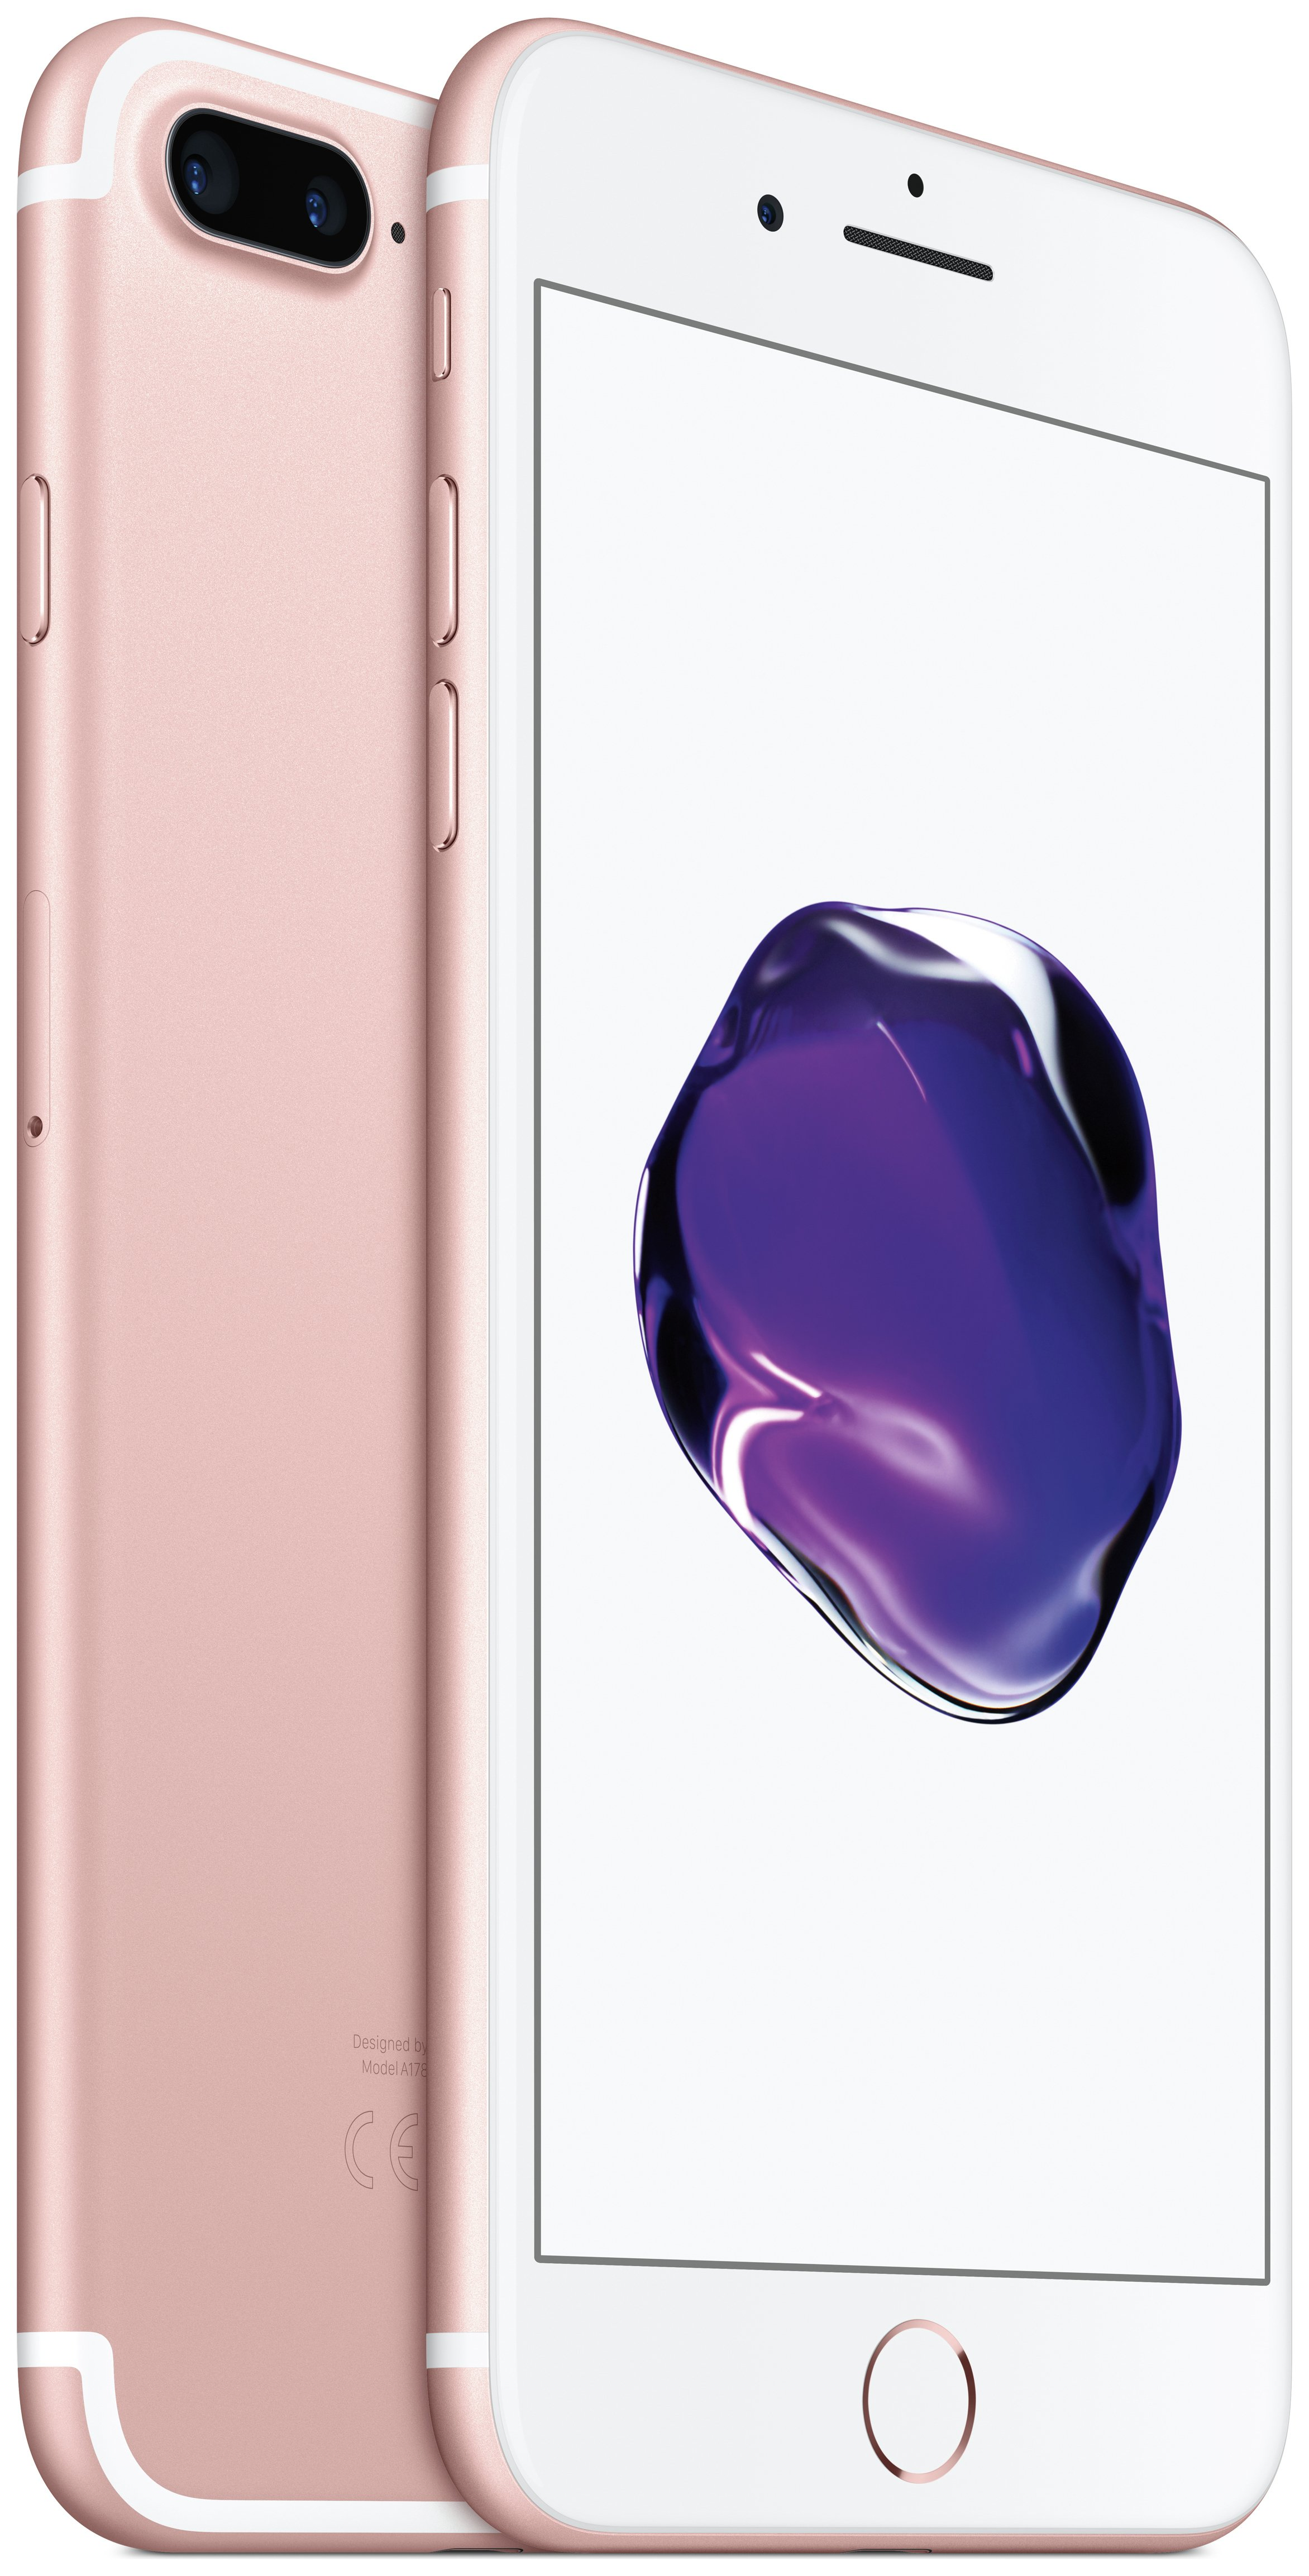 Apple Sim Free iPhone 7 Plus 128GB Mobile Phone - Rose Gold.